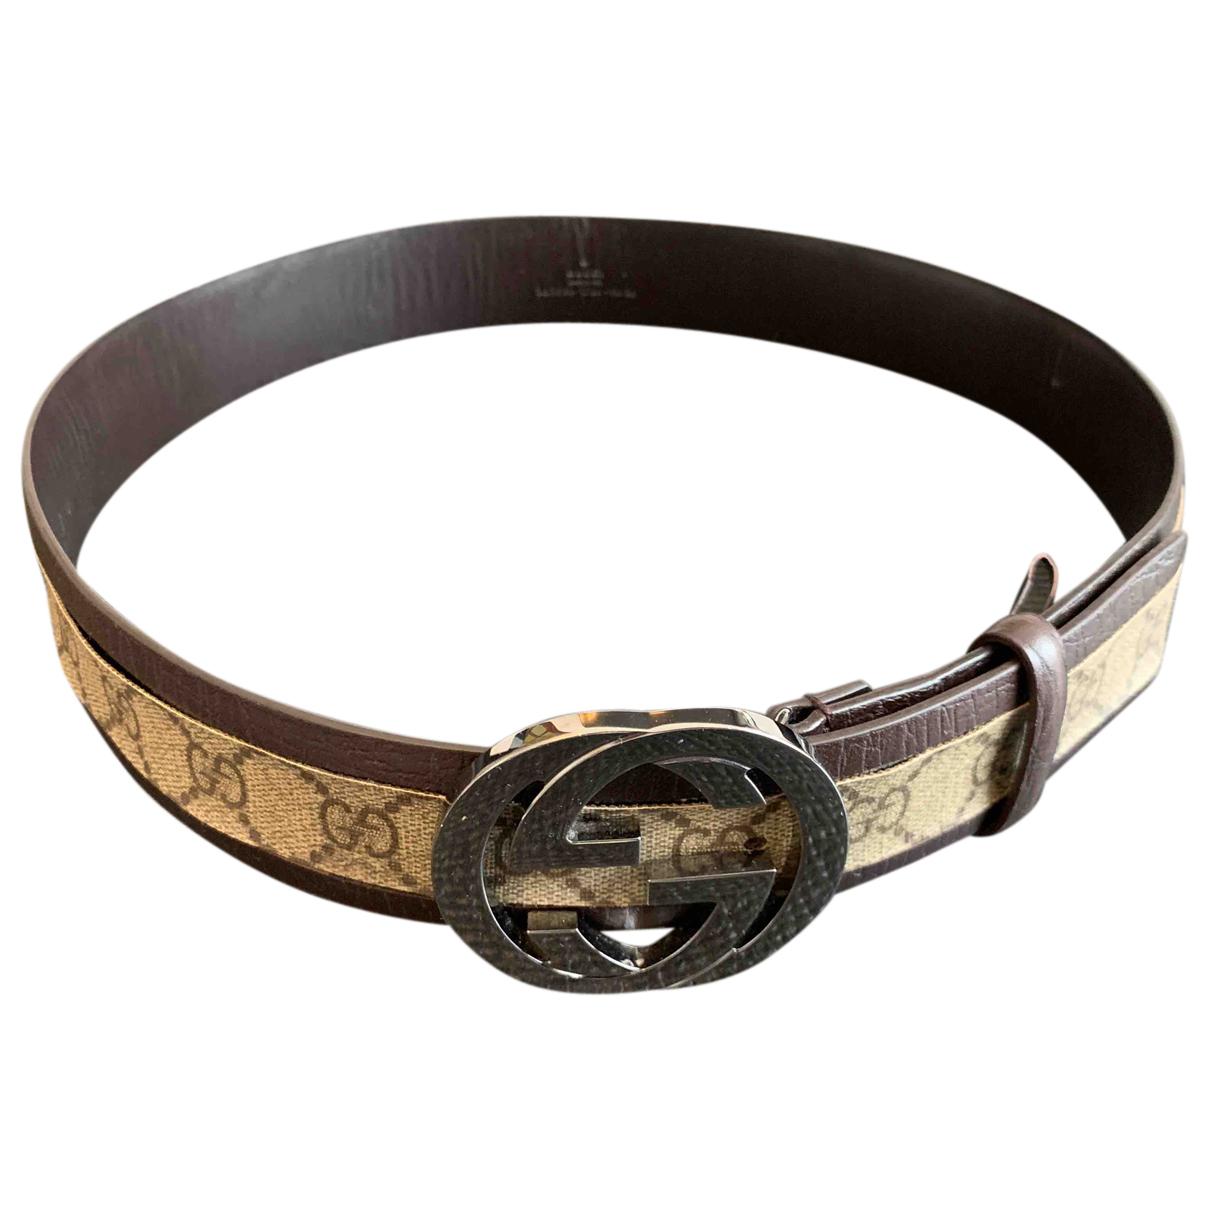 Gucci Interlocking Buckle Brown Cloth belt for Men 100 cm